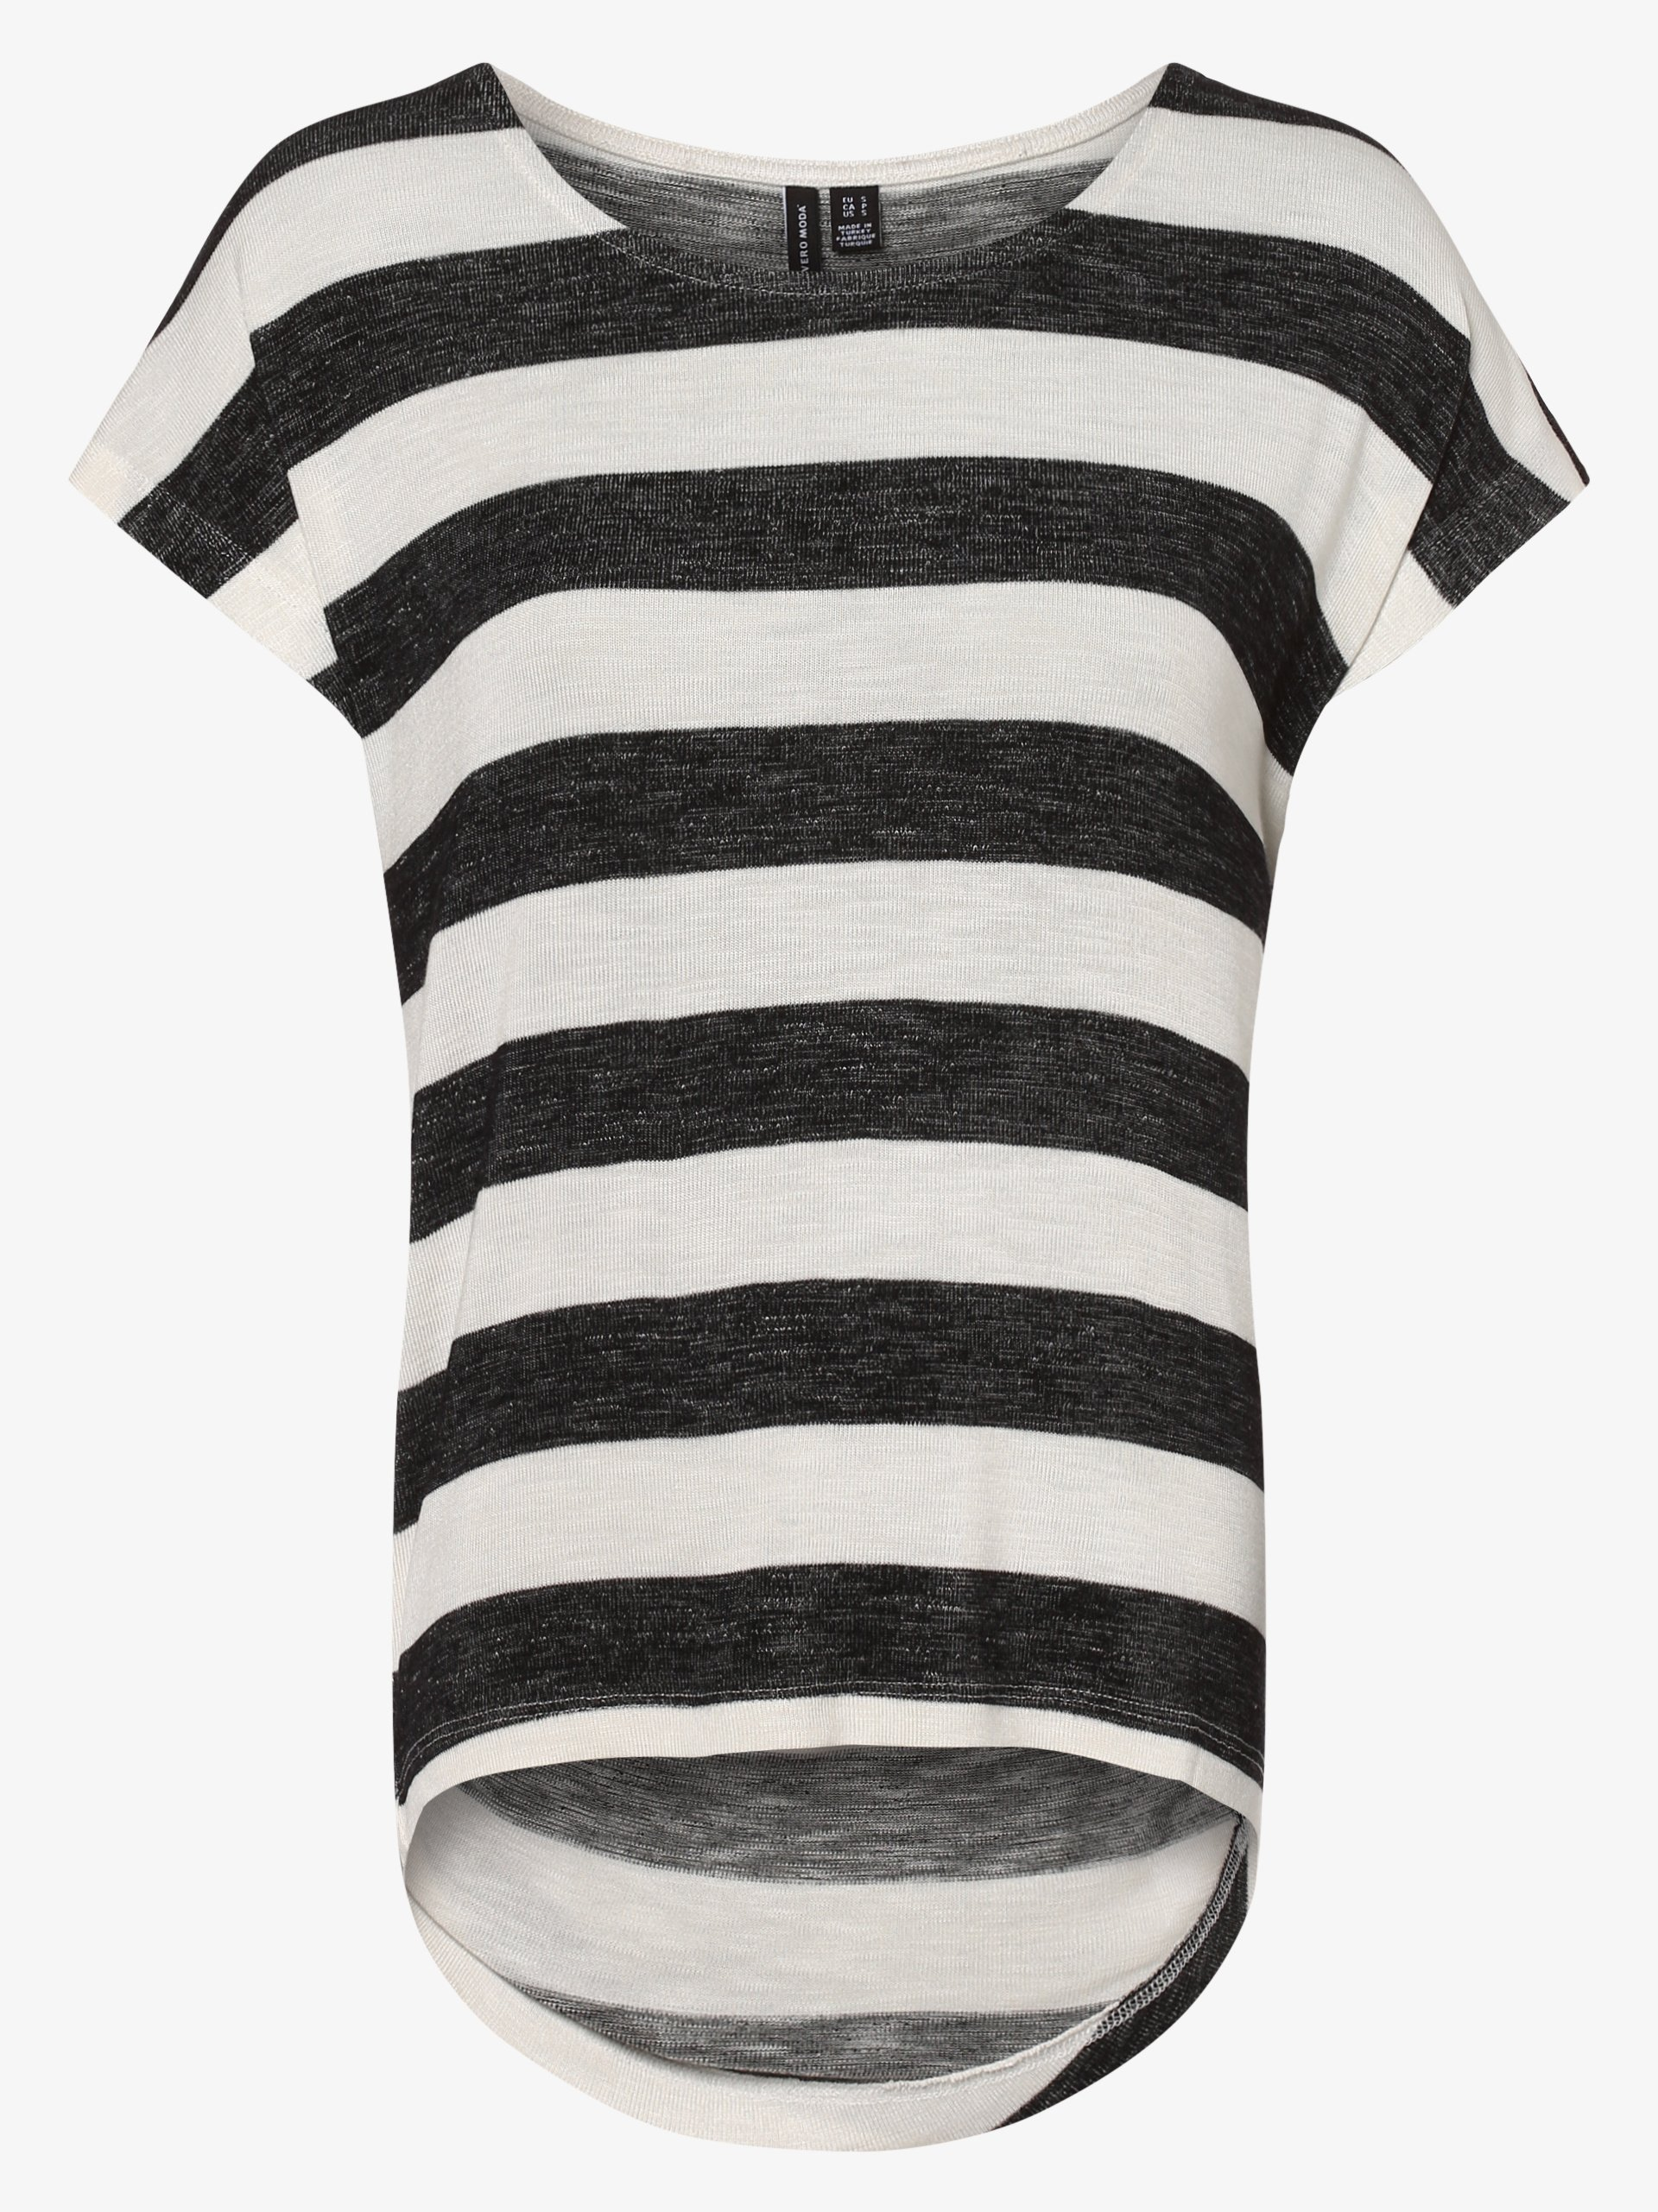 Vero Moda Damen T-Shirt - Vmwide